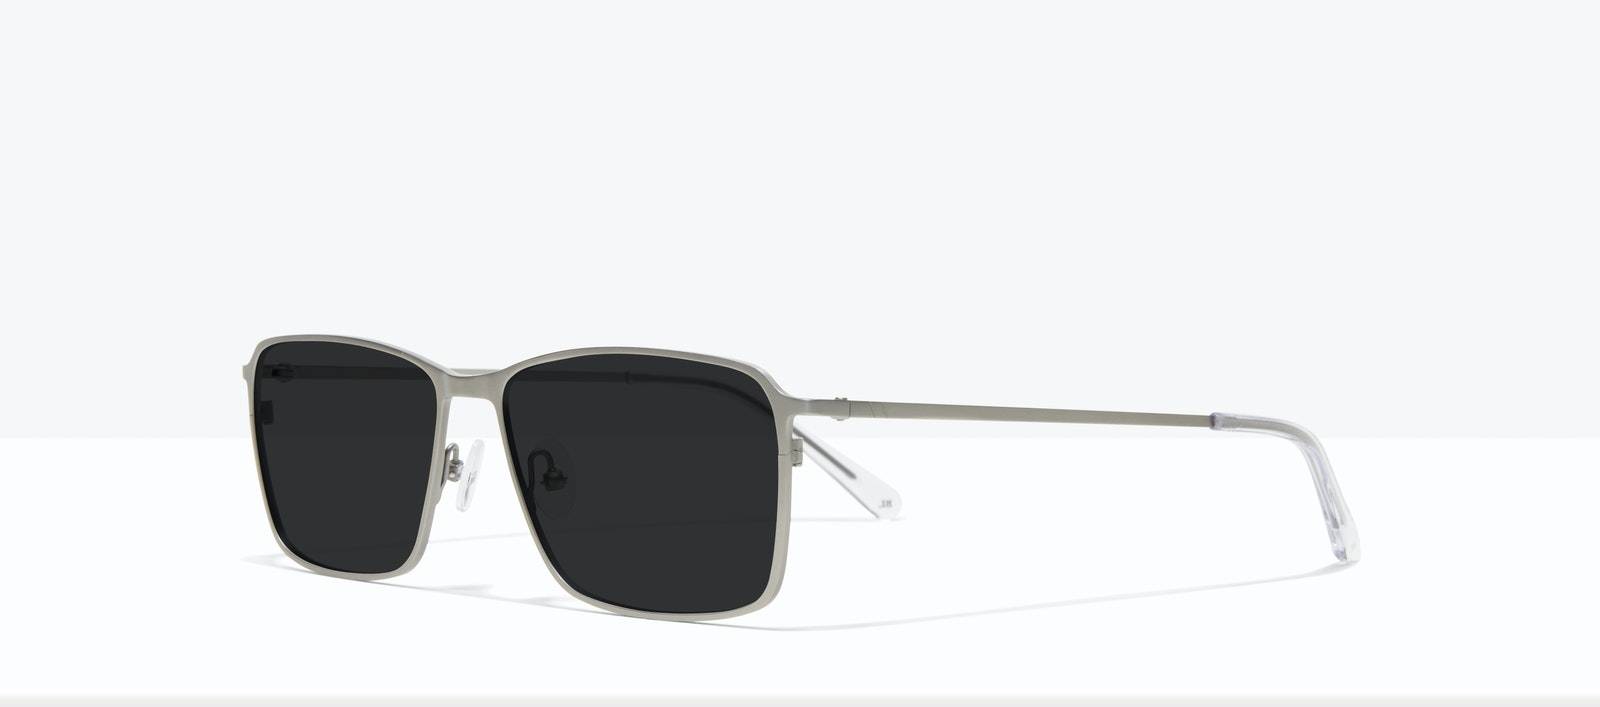 Affordable Fashion Glasses Square Sunglasses Men Drive Silver Tilt